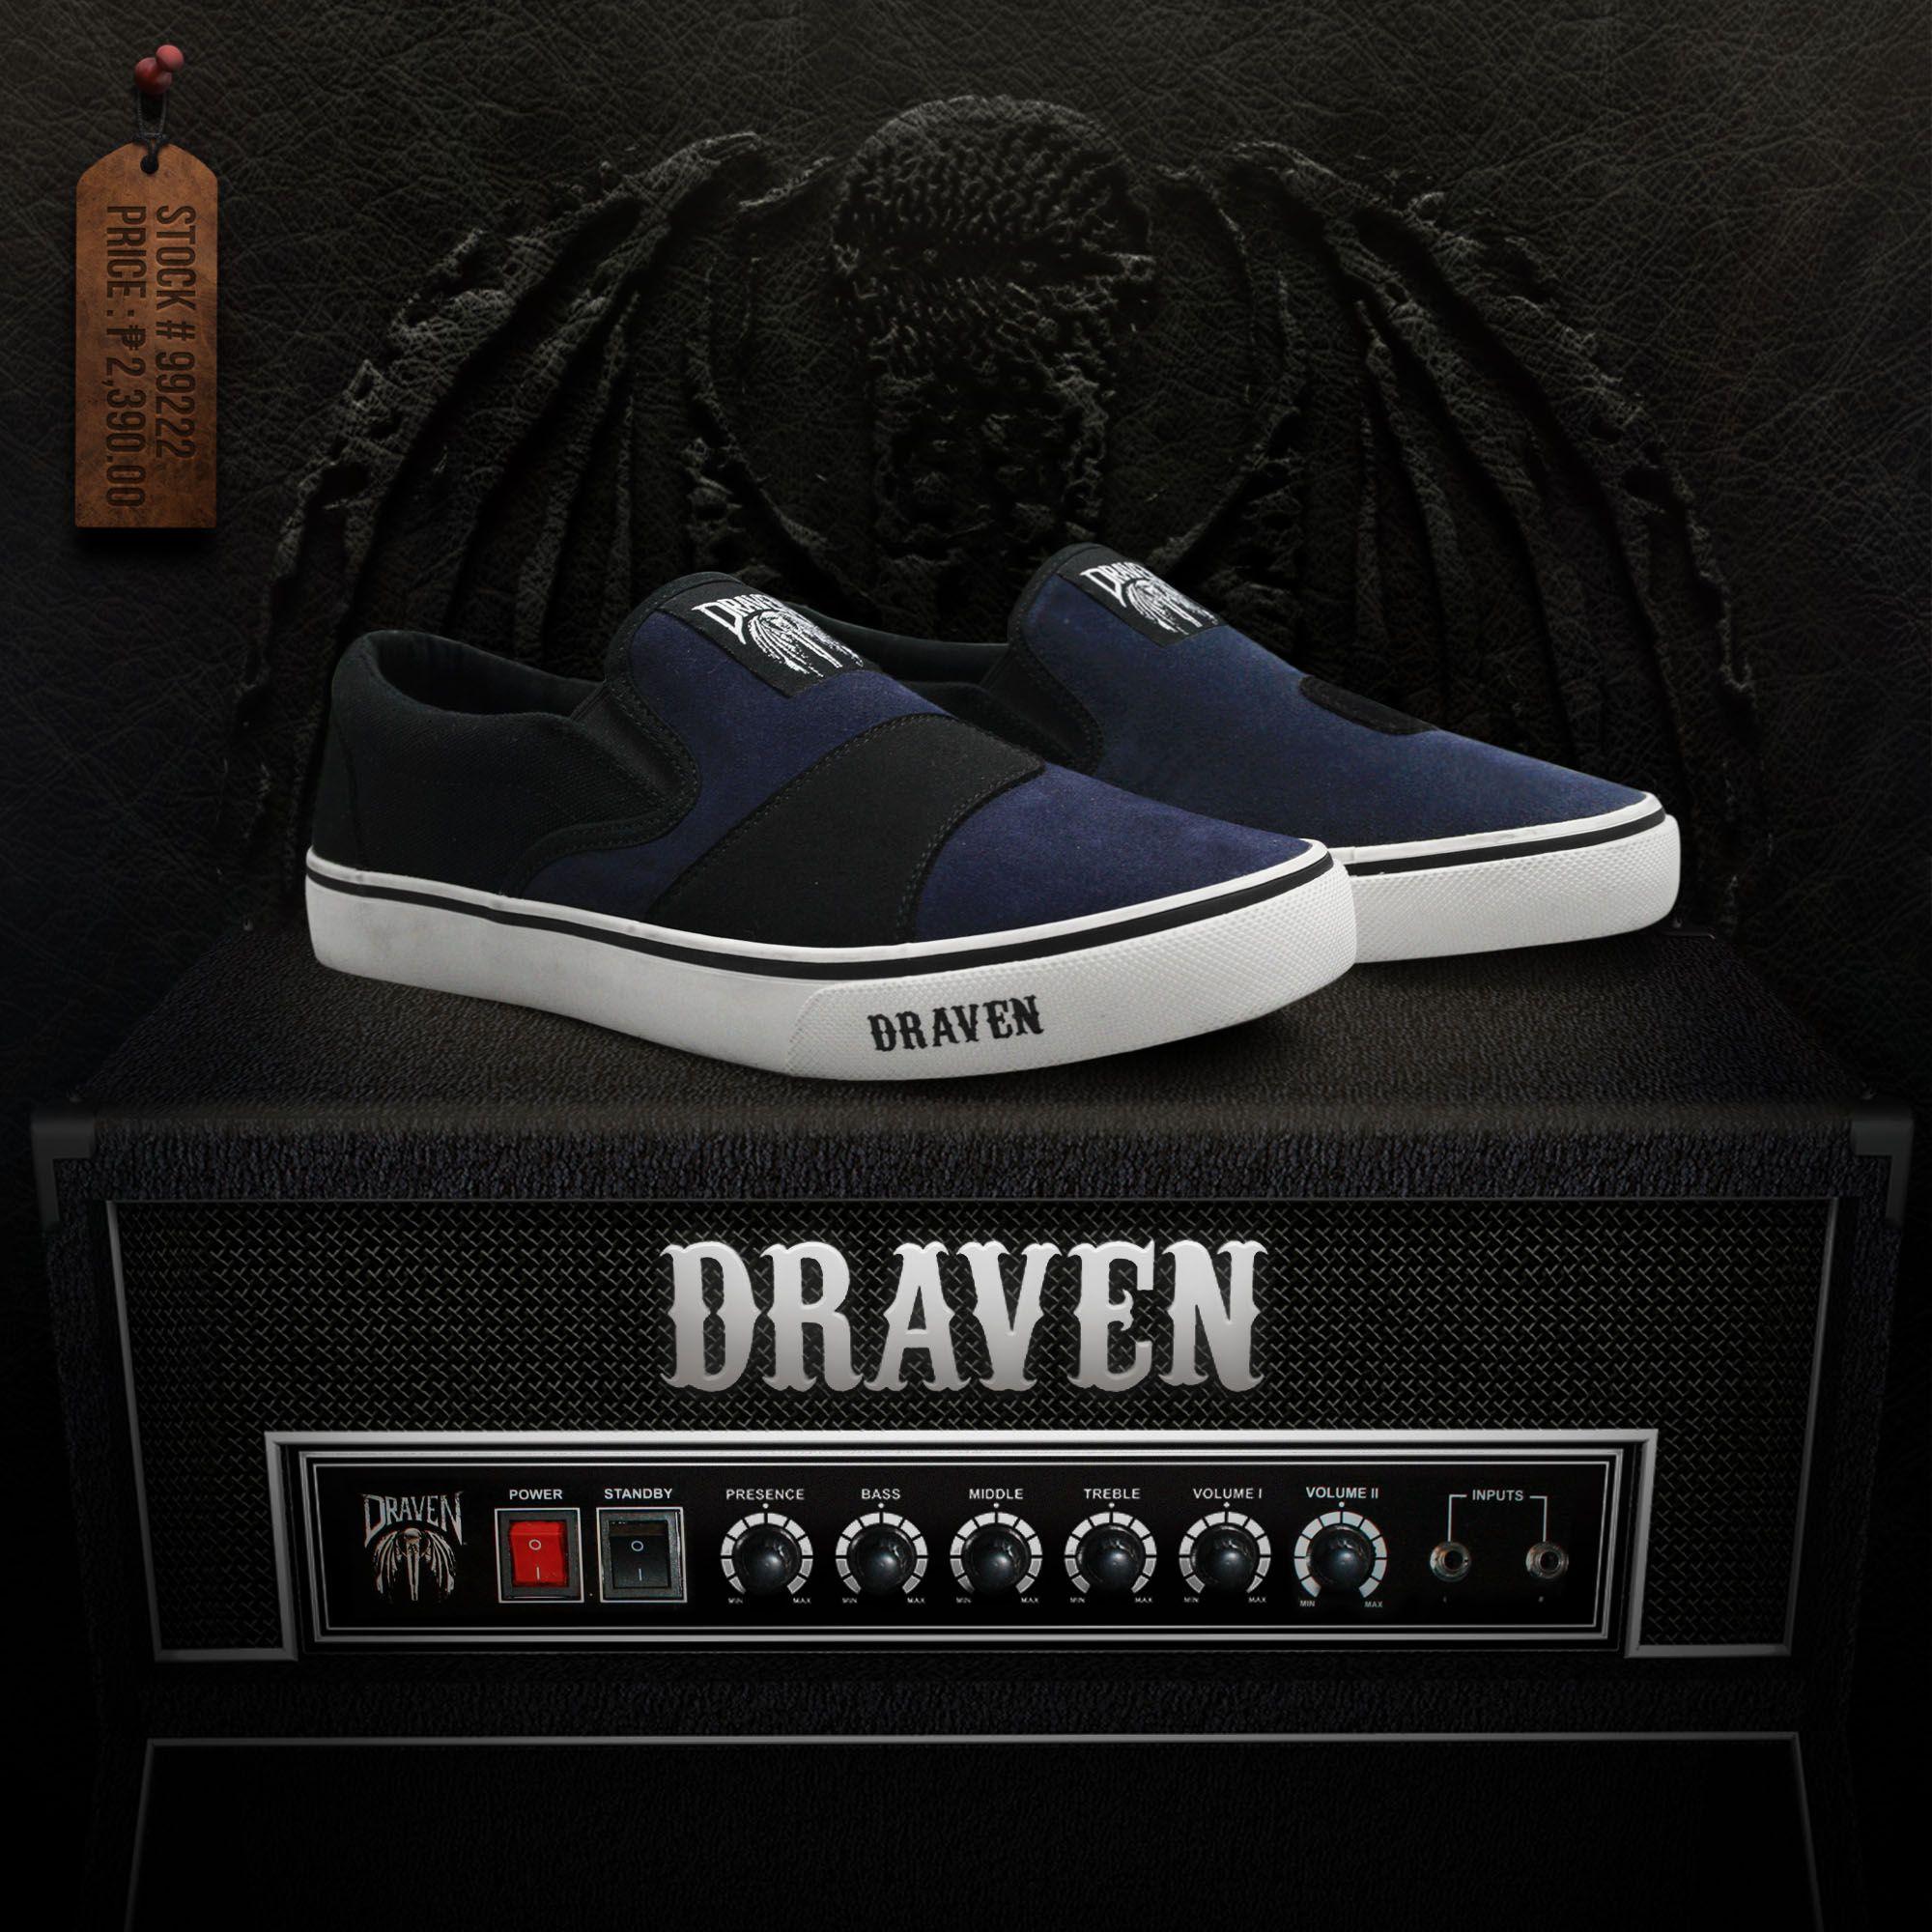 8efd68ee75a3 Draven 99220 Slip-on Kicks, Slip On, Sneakers, Shoes, Fashion,